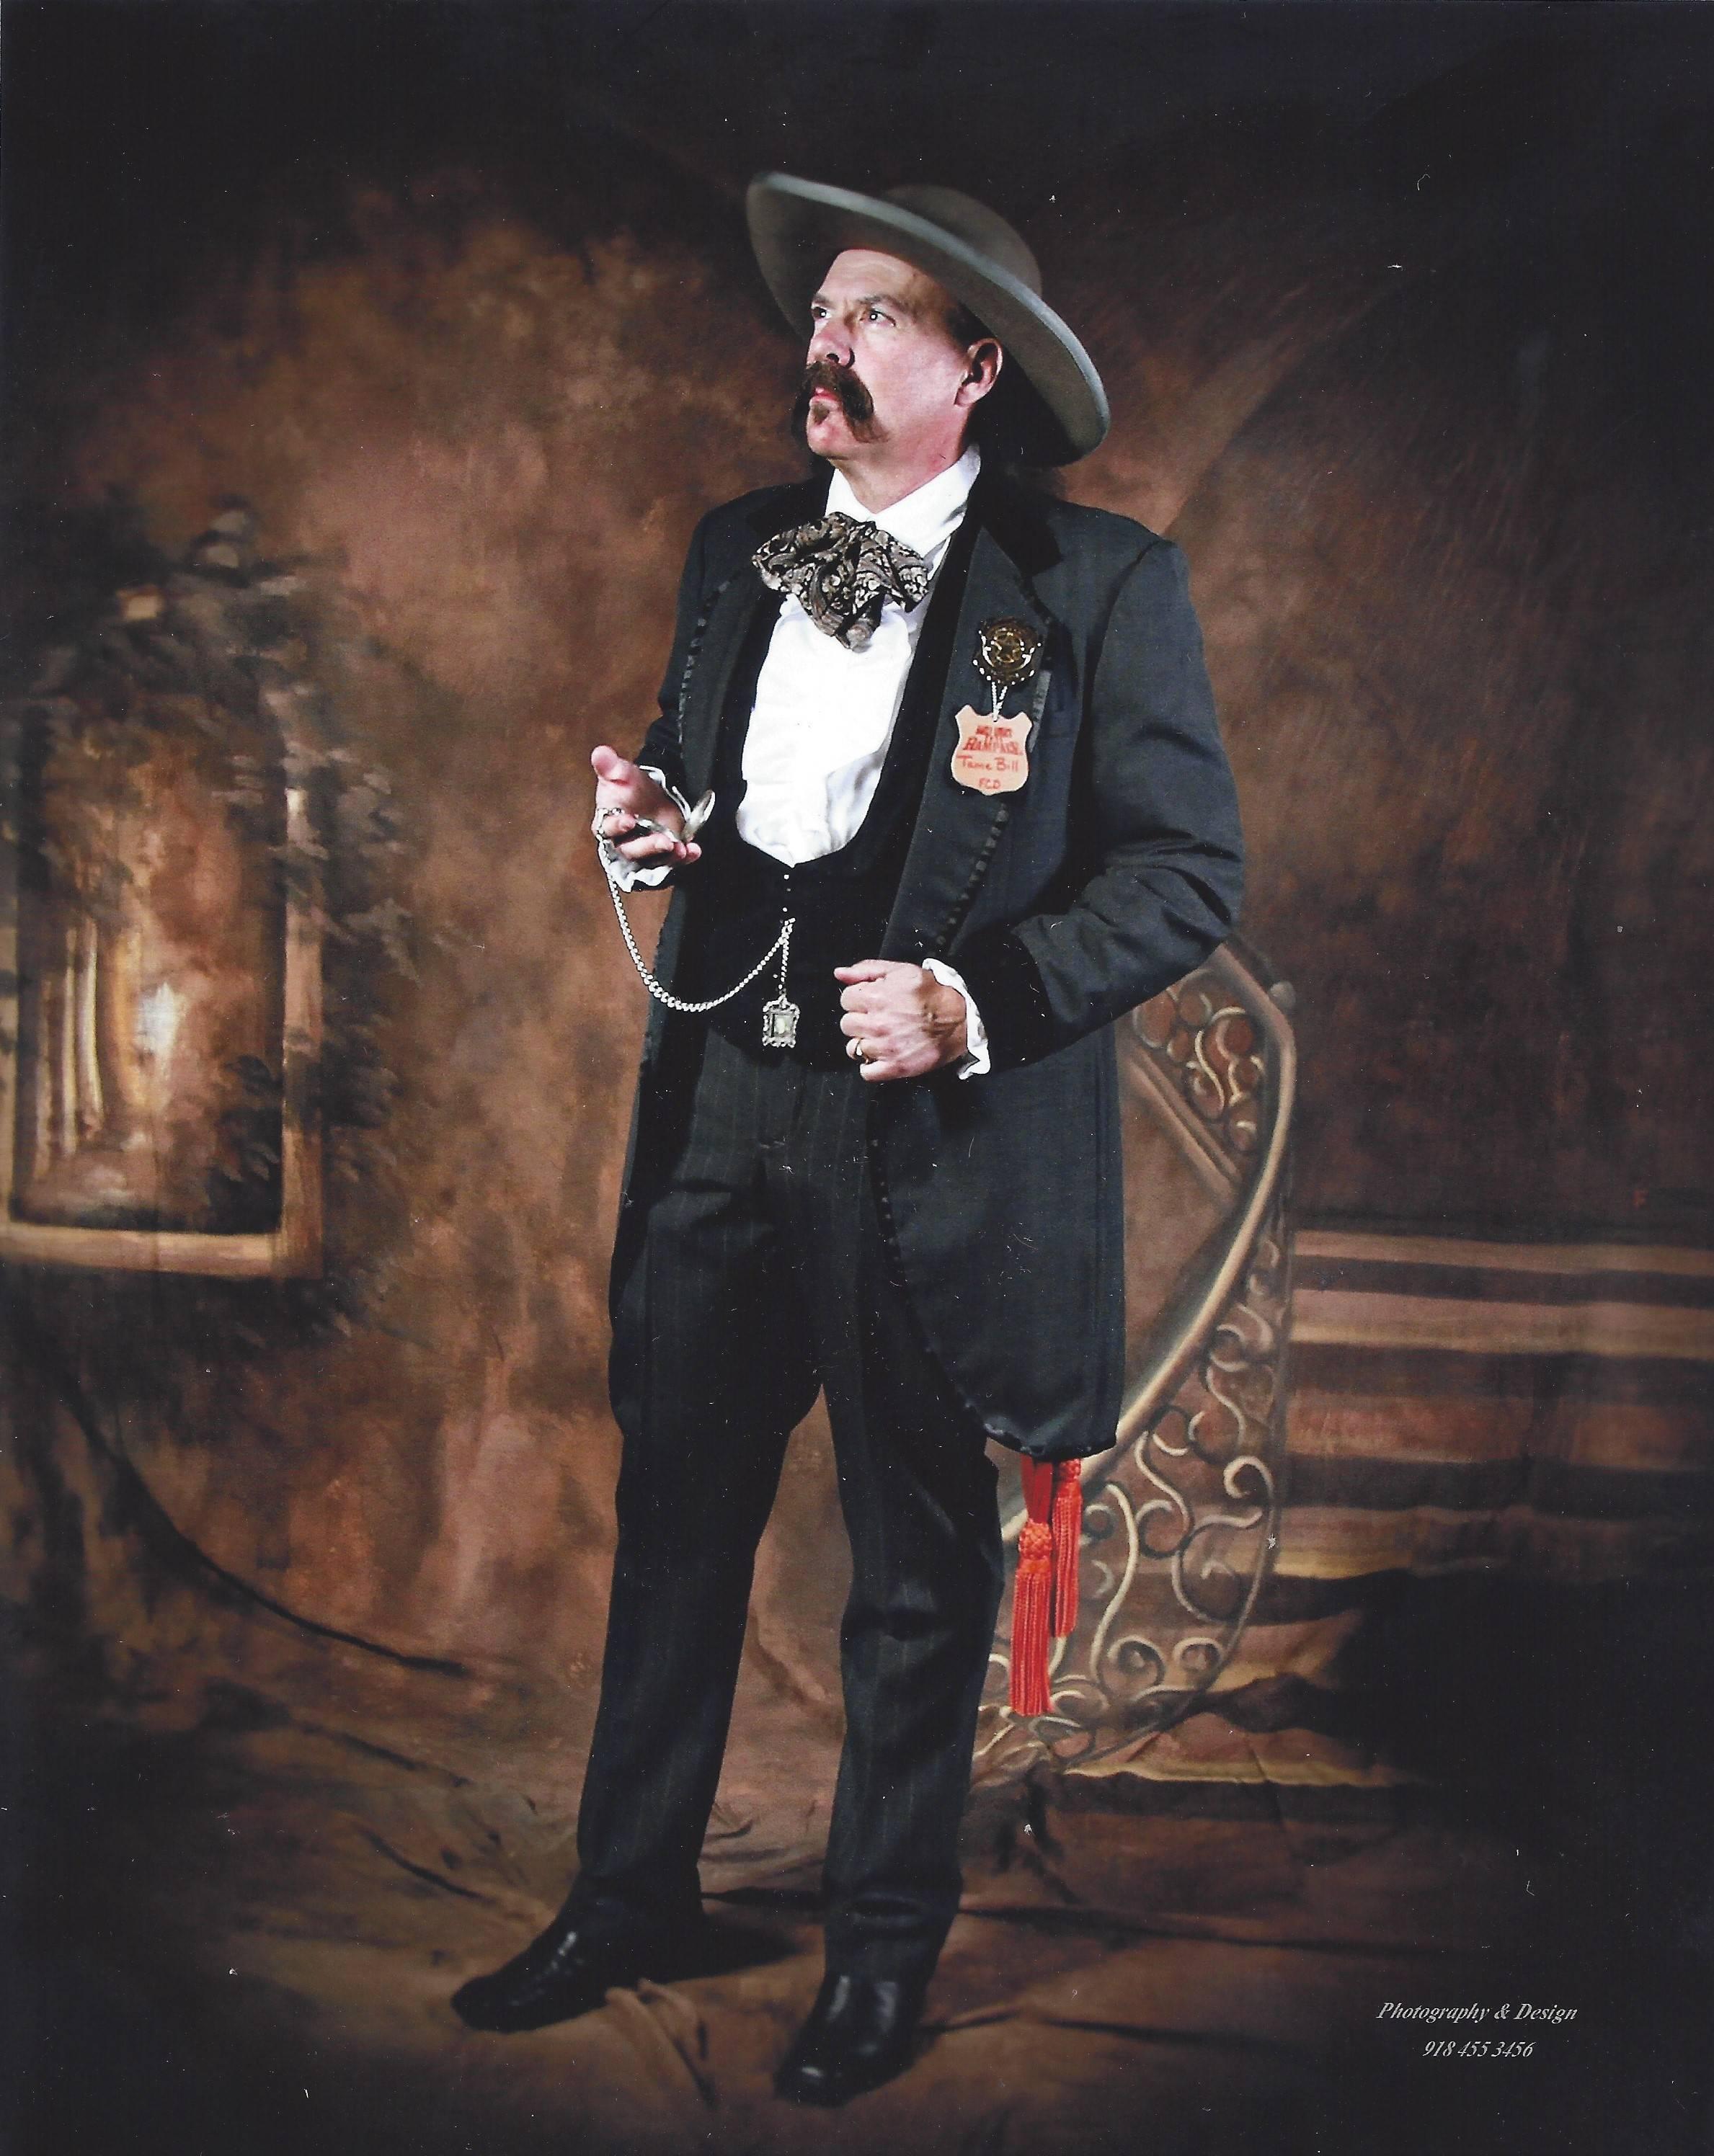 Best Dress Gentleman - Award Picture